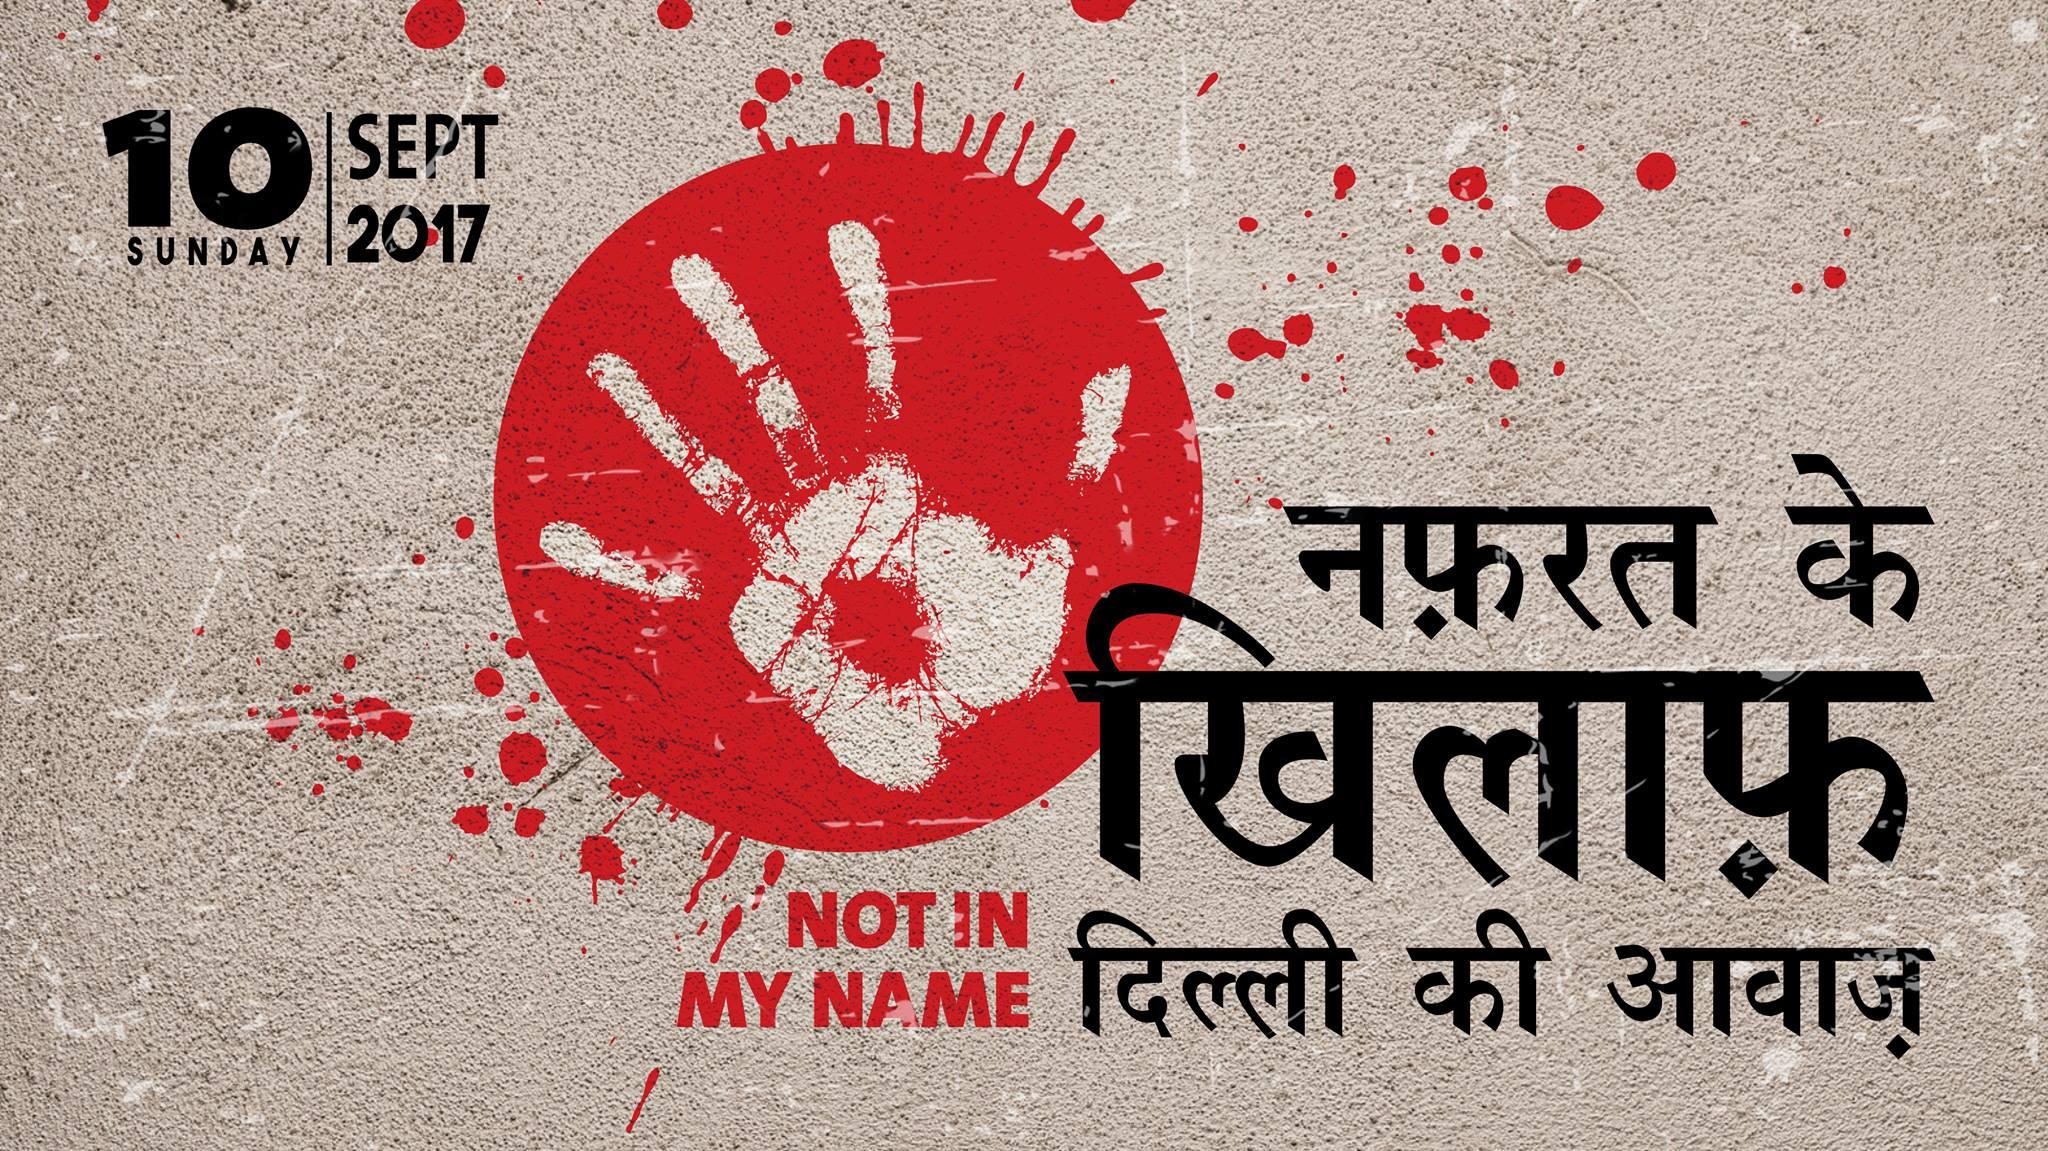 Say No To Hatred | नफरत के ख़िलाफ़, दिल्ली की आवाज़